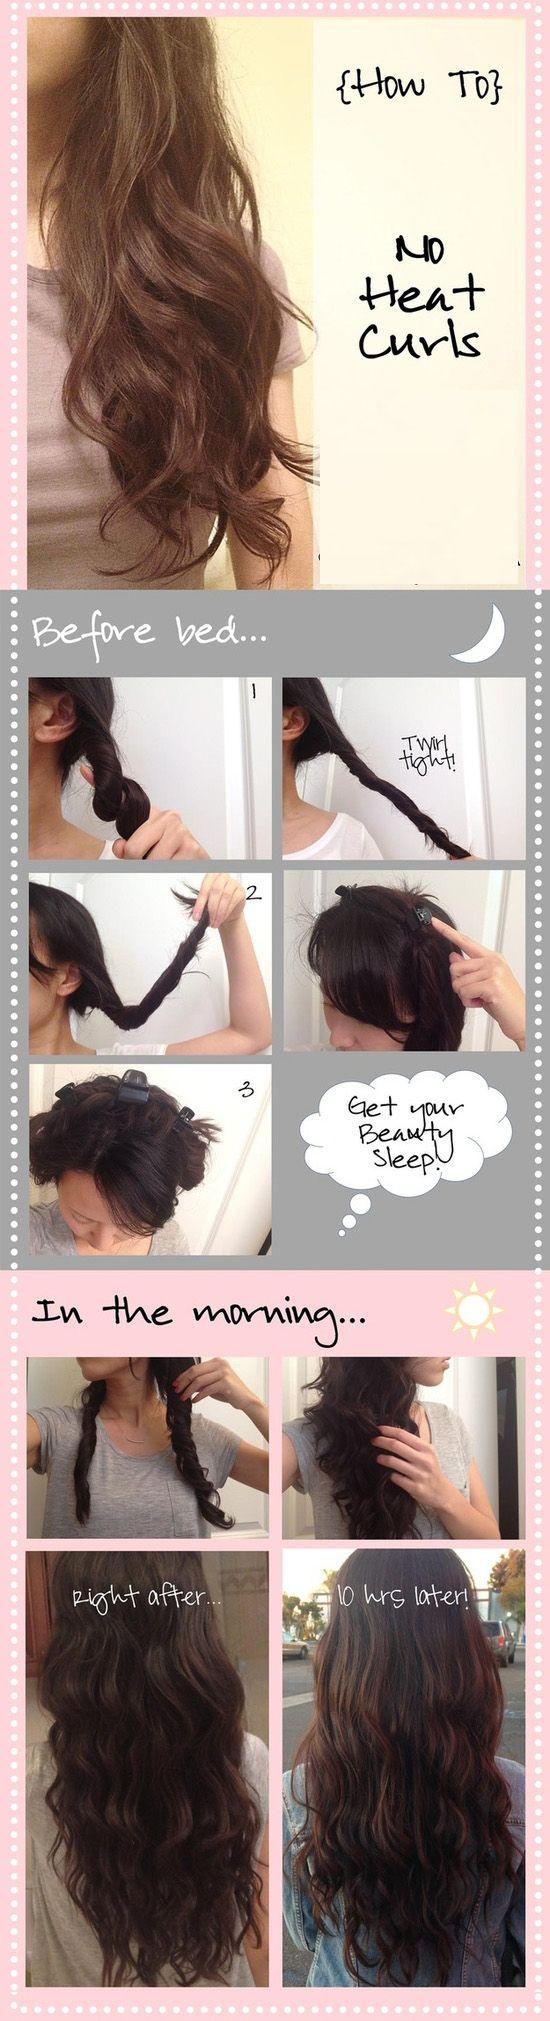 Night hair